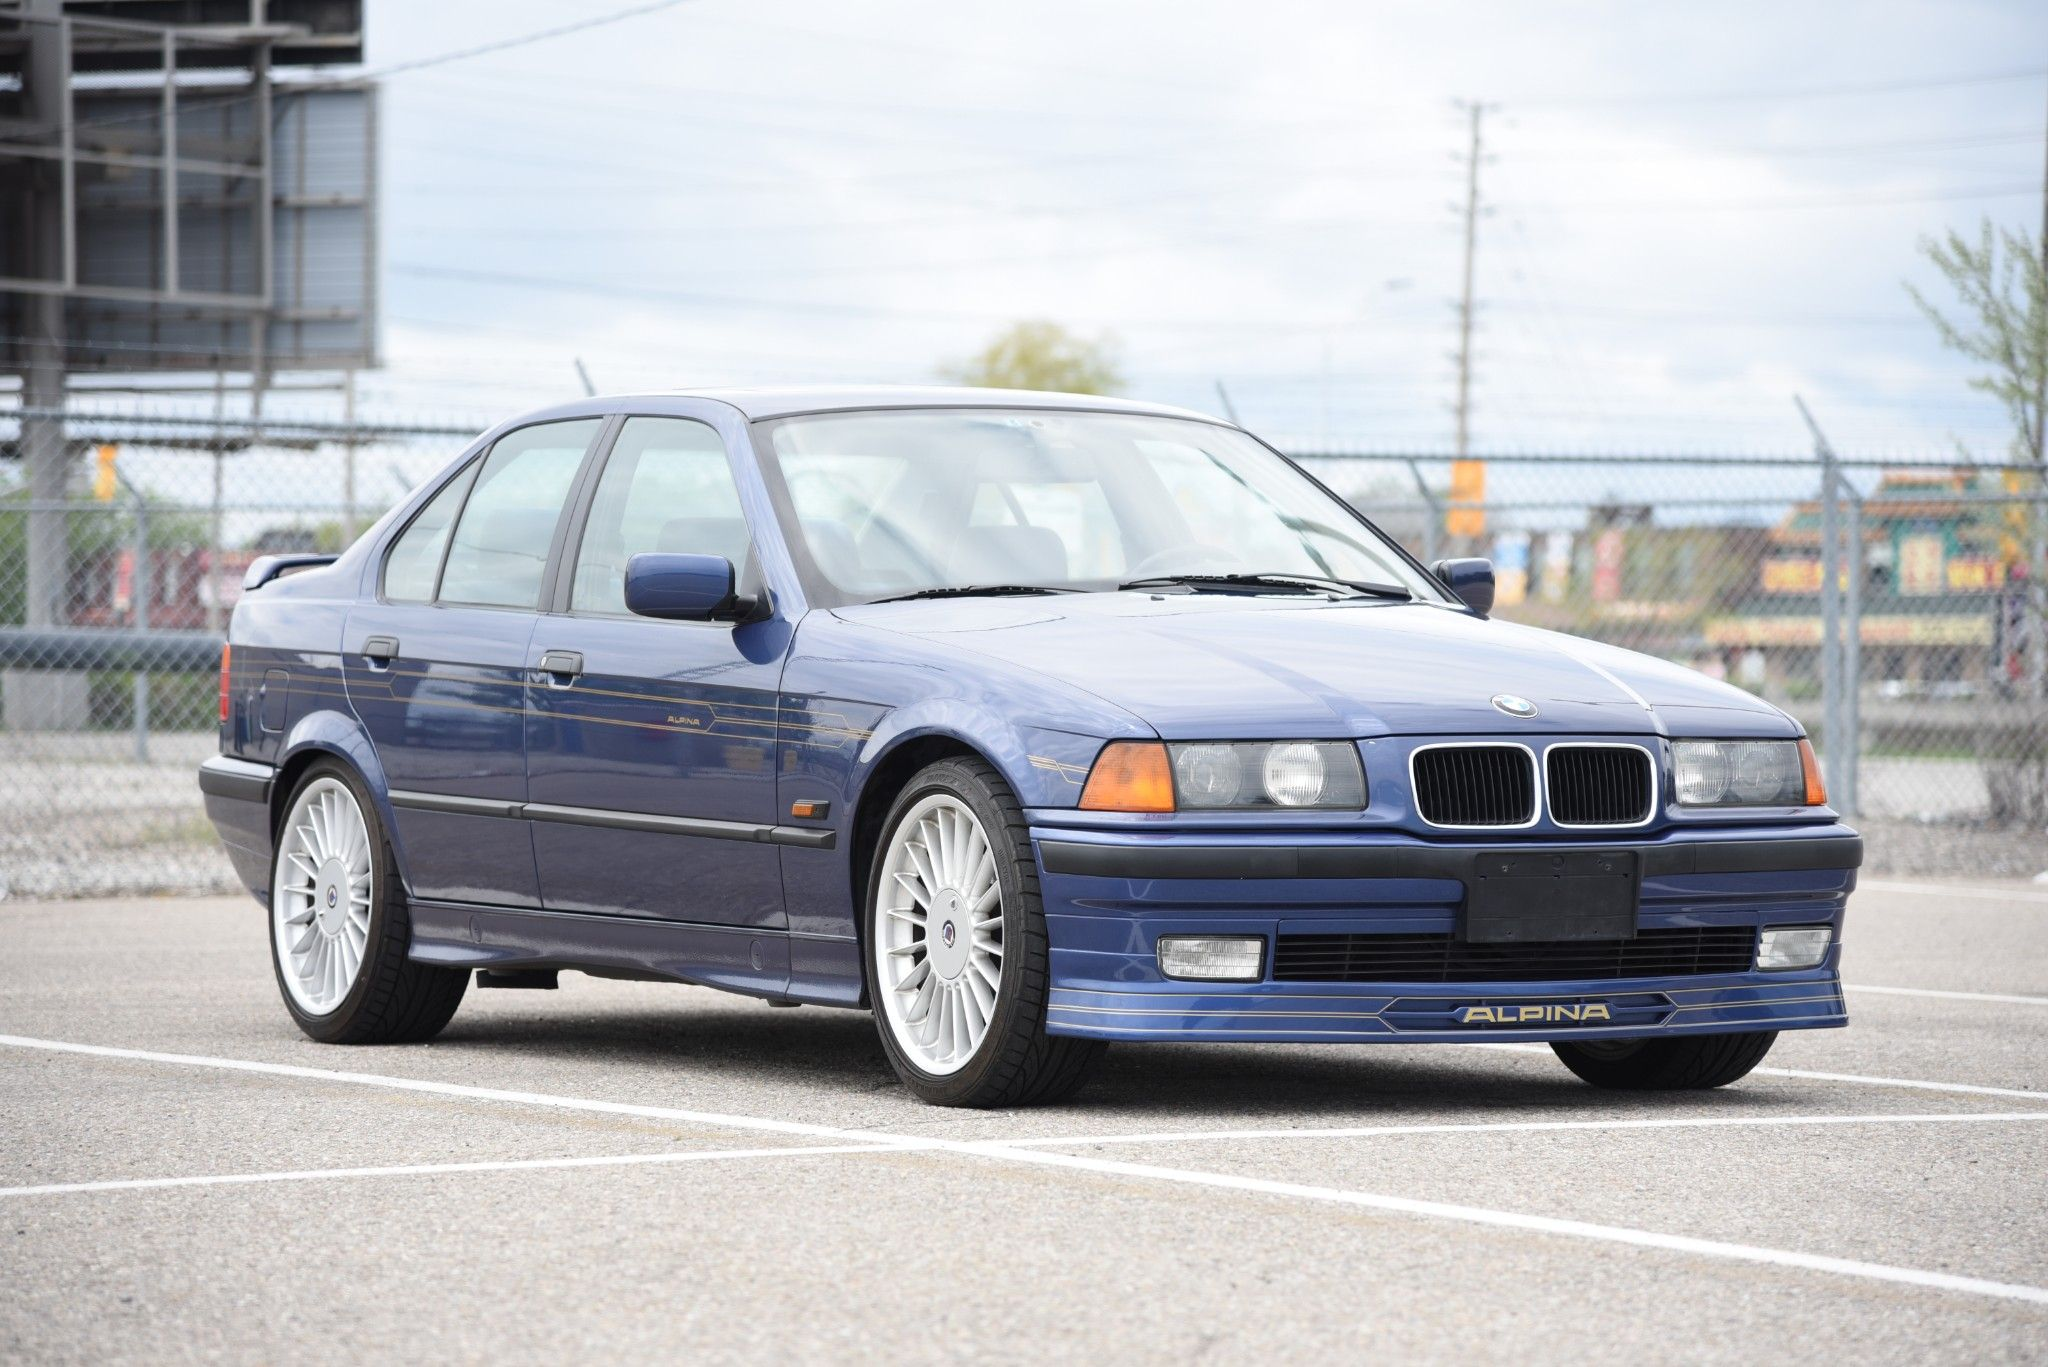 i need an e36 alpina b3 saloon bmw alpina bmw wagon bmw e36 bmw alpina bmw wagon bmw e36